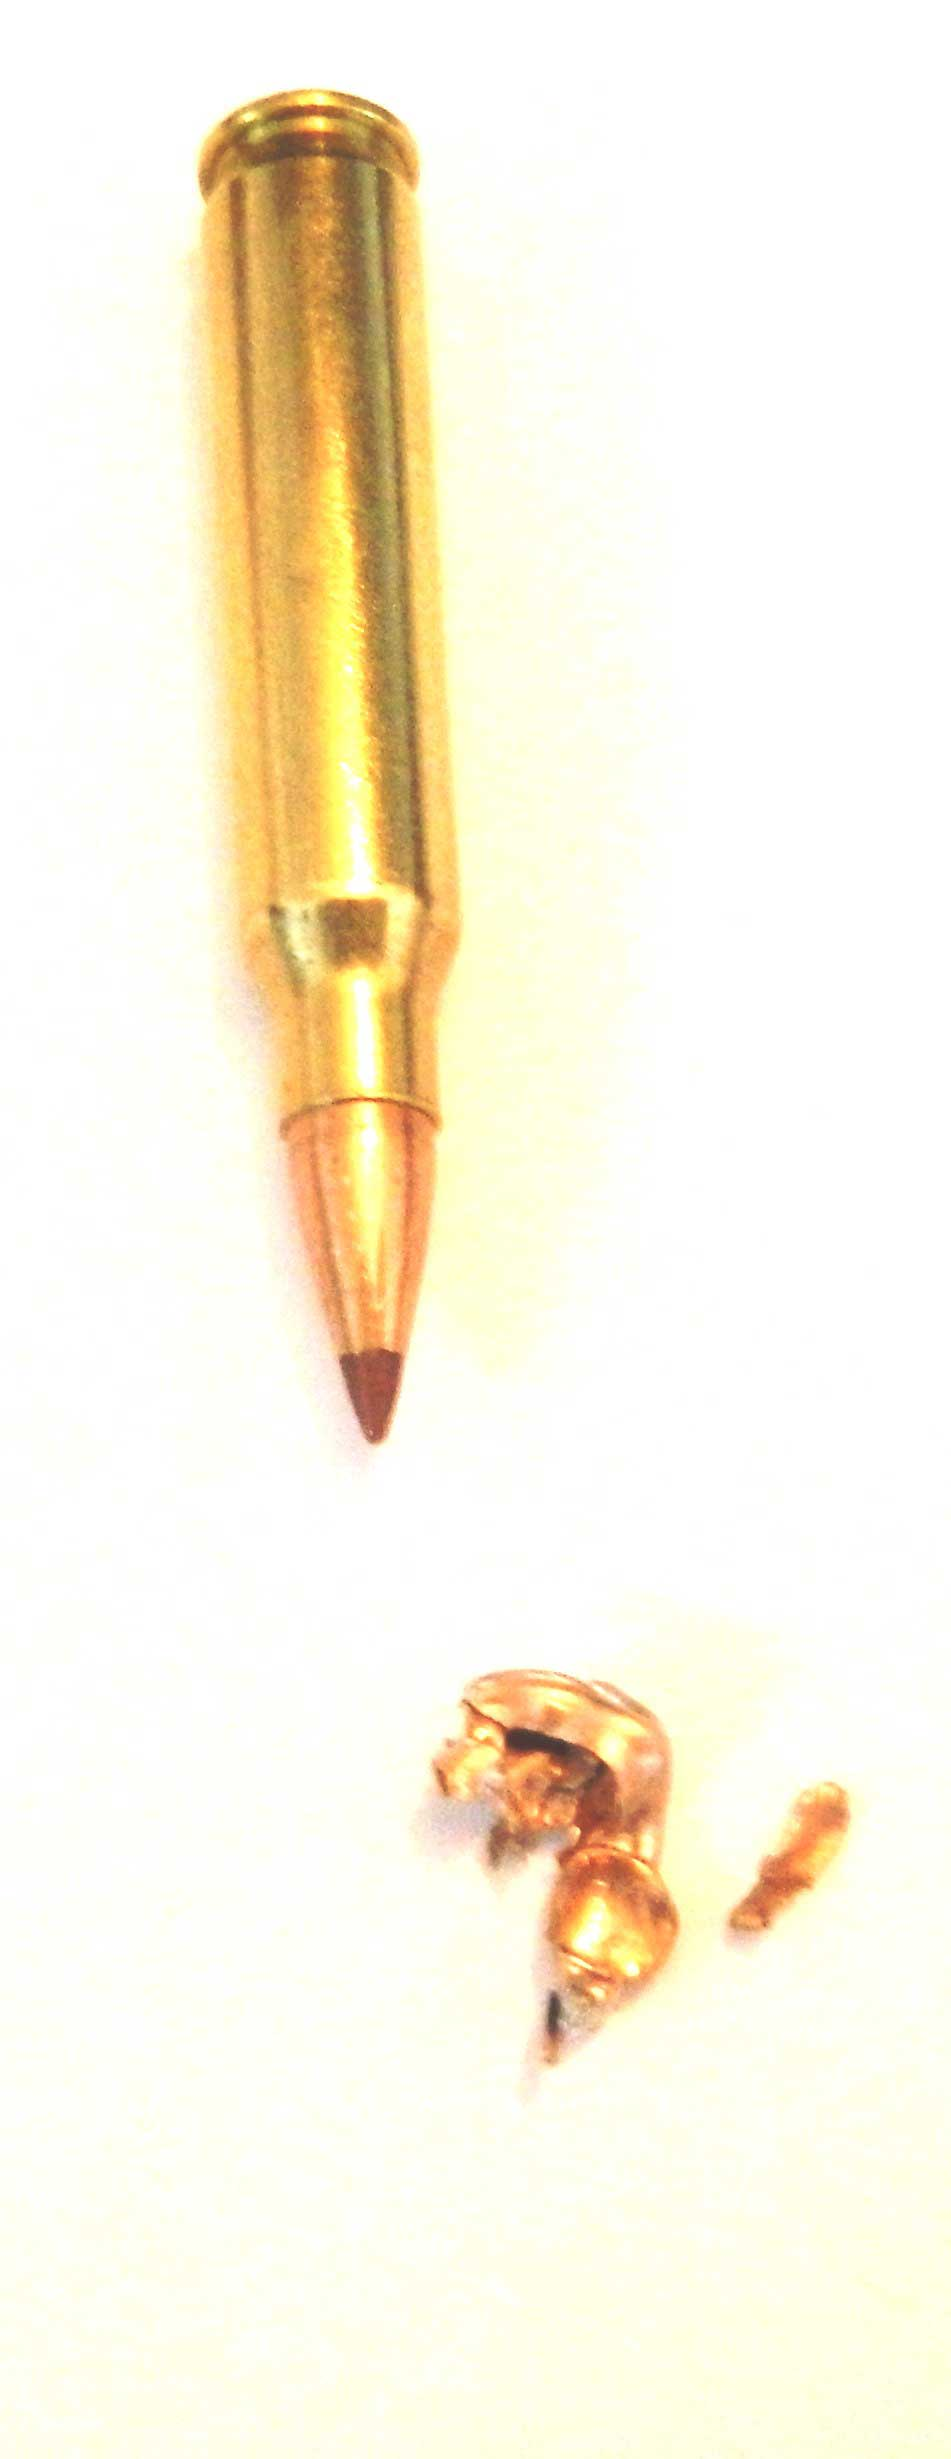 .223 Remington cartridge and spent bullet